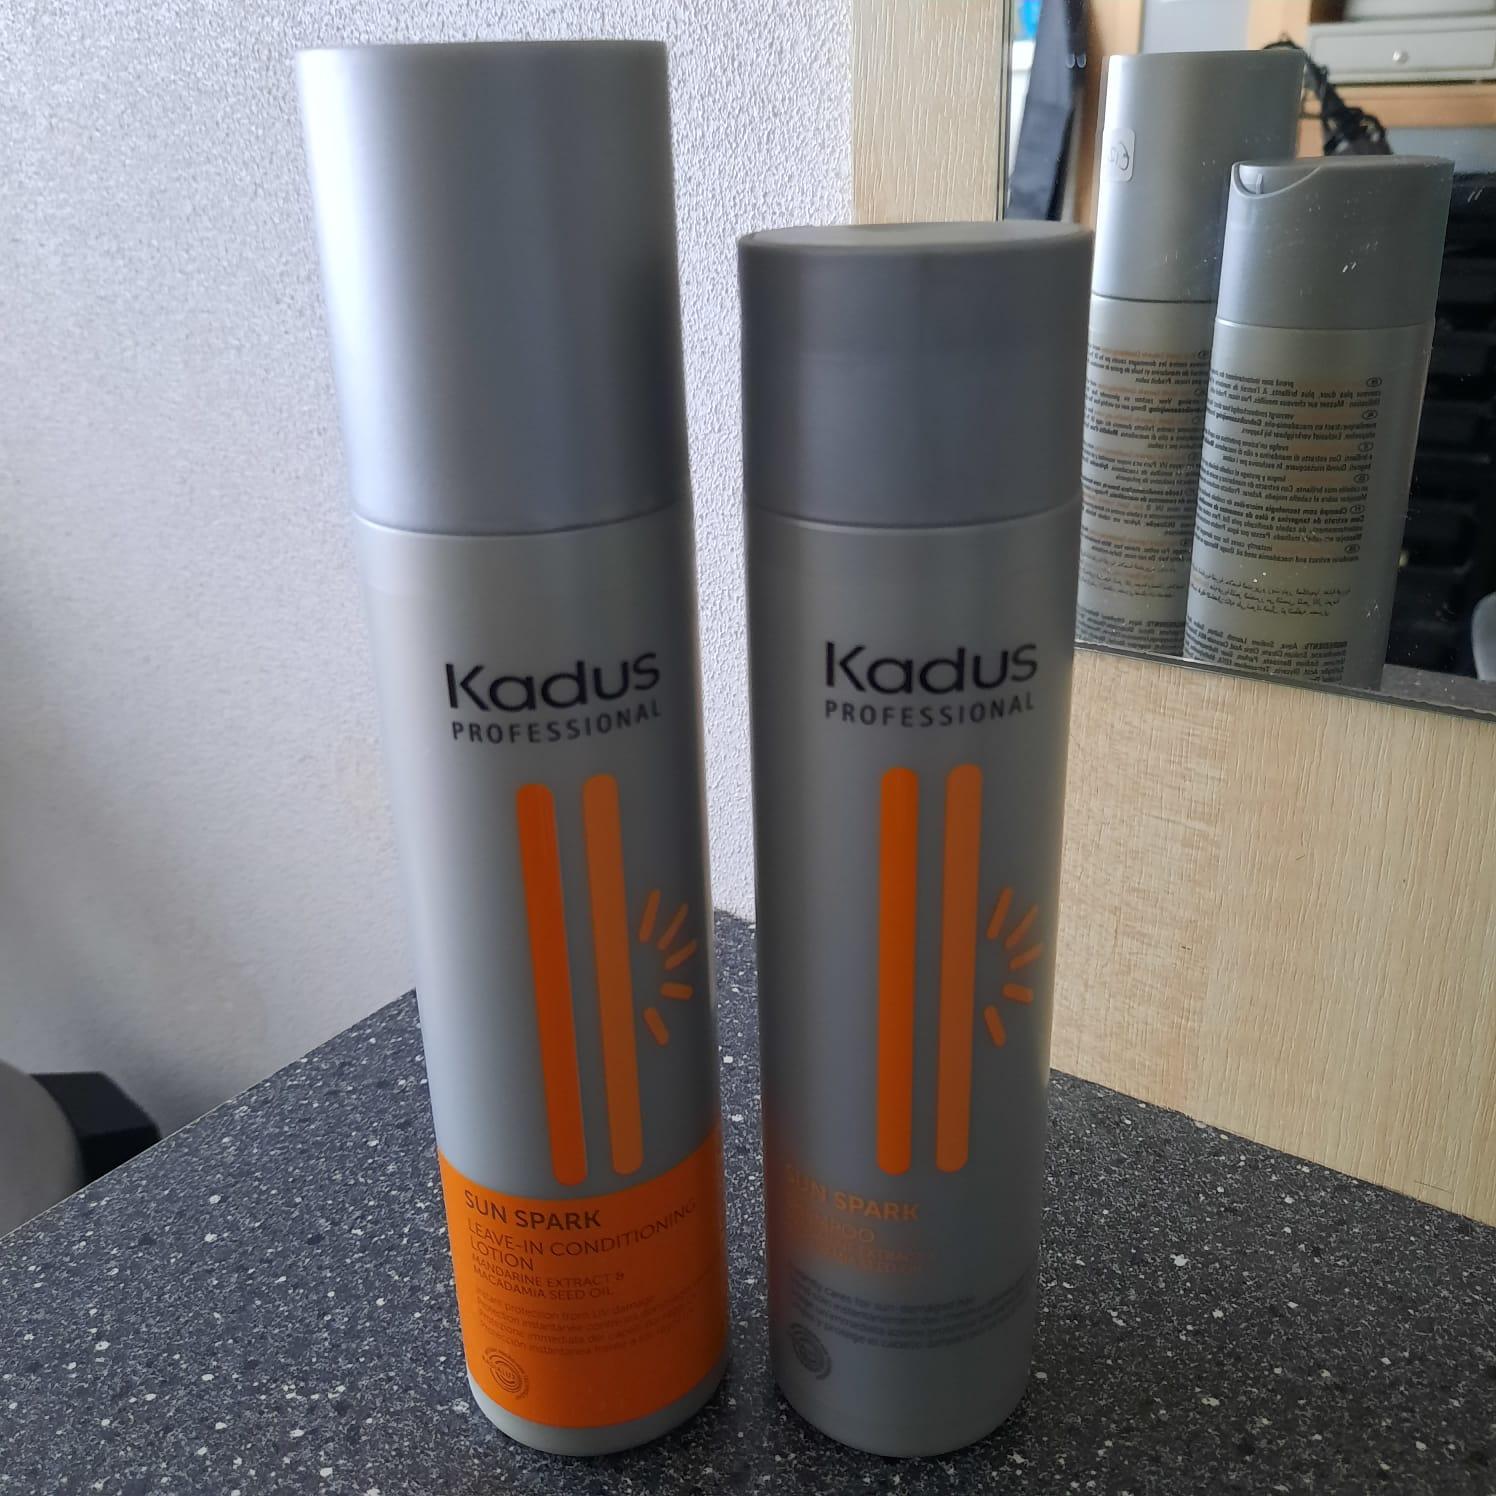 Kadus Product 2